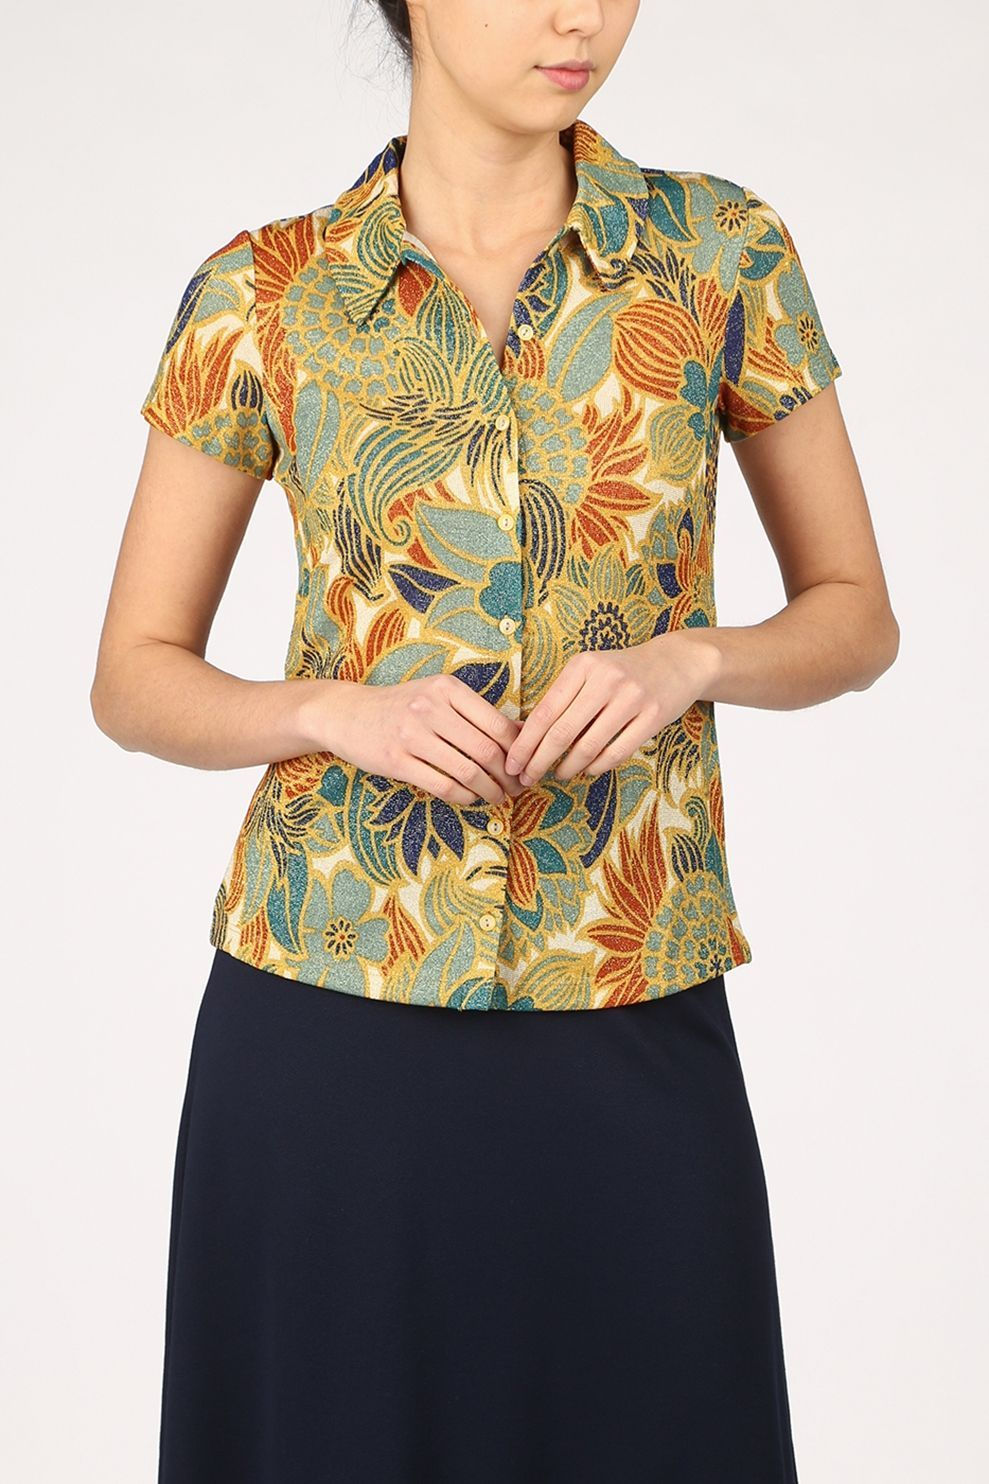 King Louie T-Shirt San Felipe voor dames - Bruin/Groen - Maten: XS, S, M, L, XL